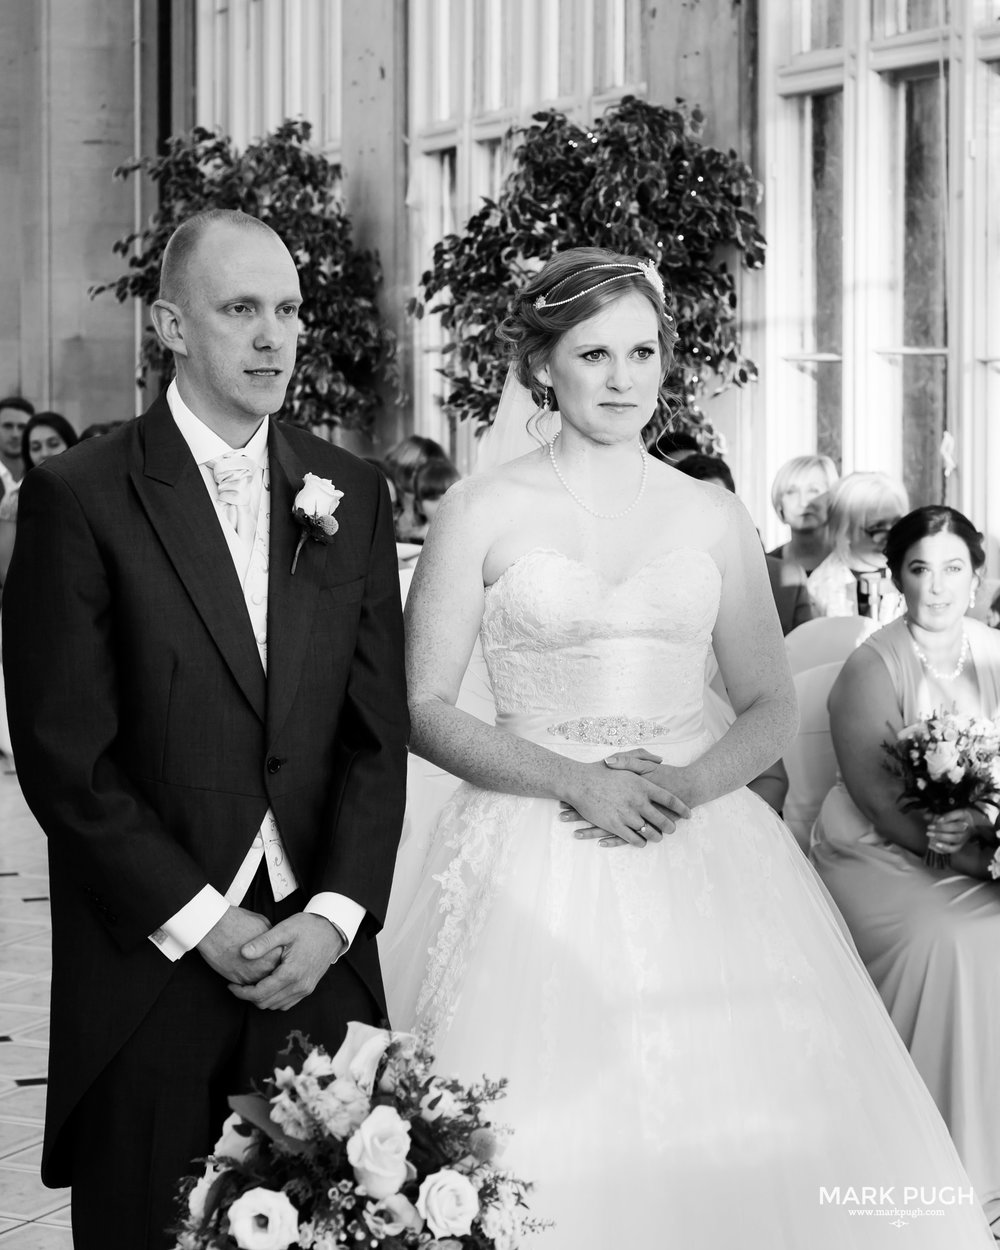 049 - Fay and Craig - fineART Wedding Photography at Stoke Rochford Hall NG33 5EJ by www.markpugh.com Mark Pugh of www.mpmedia.co.uk_.JPG